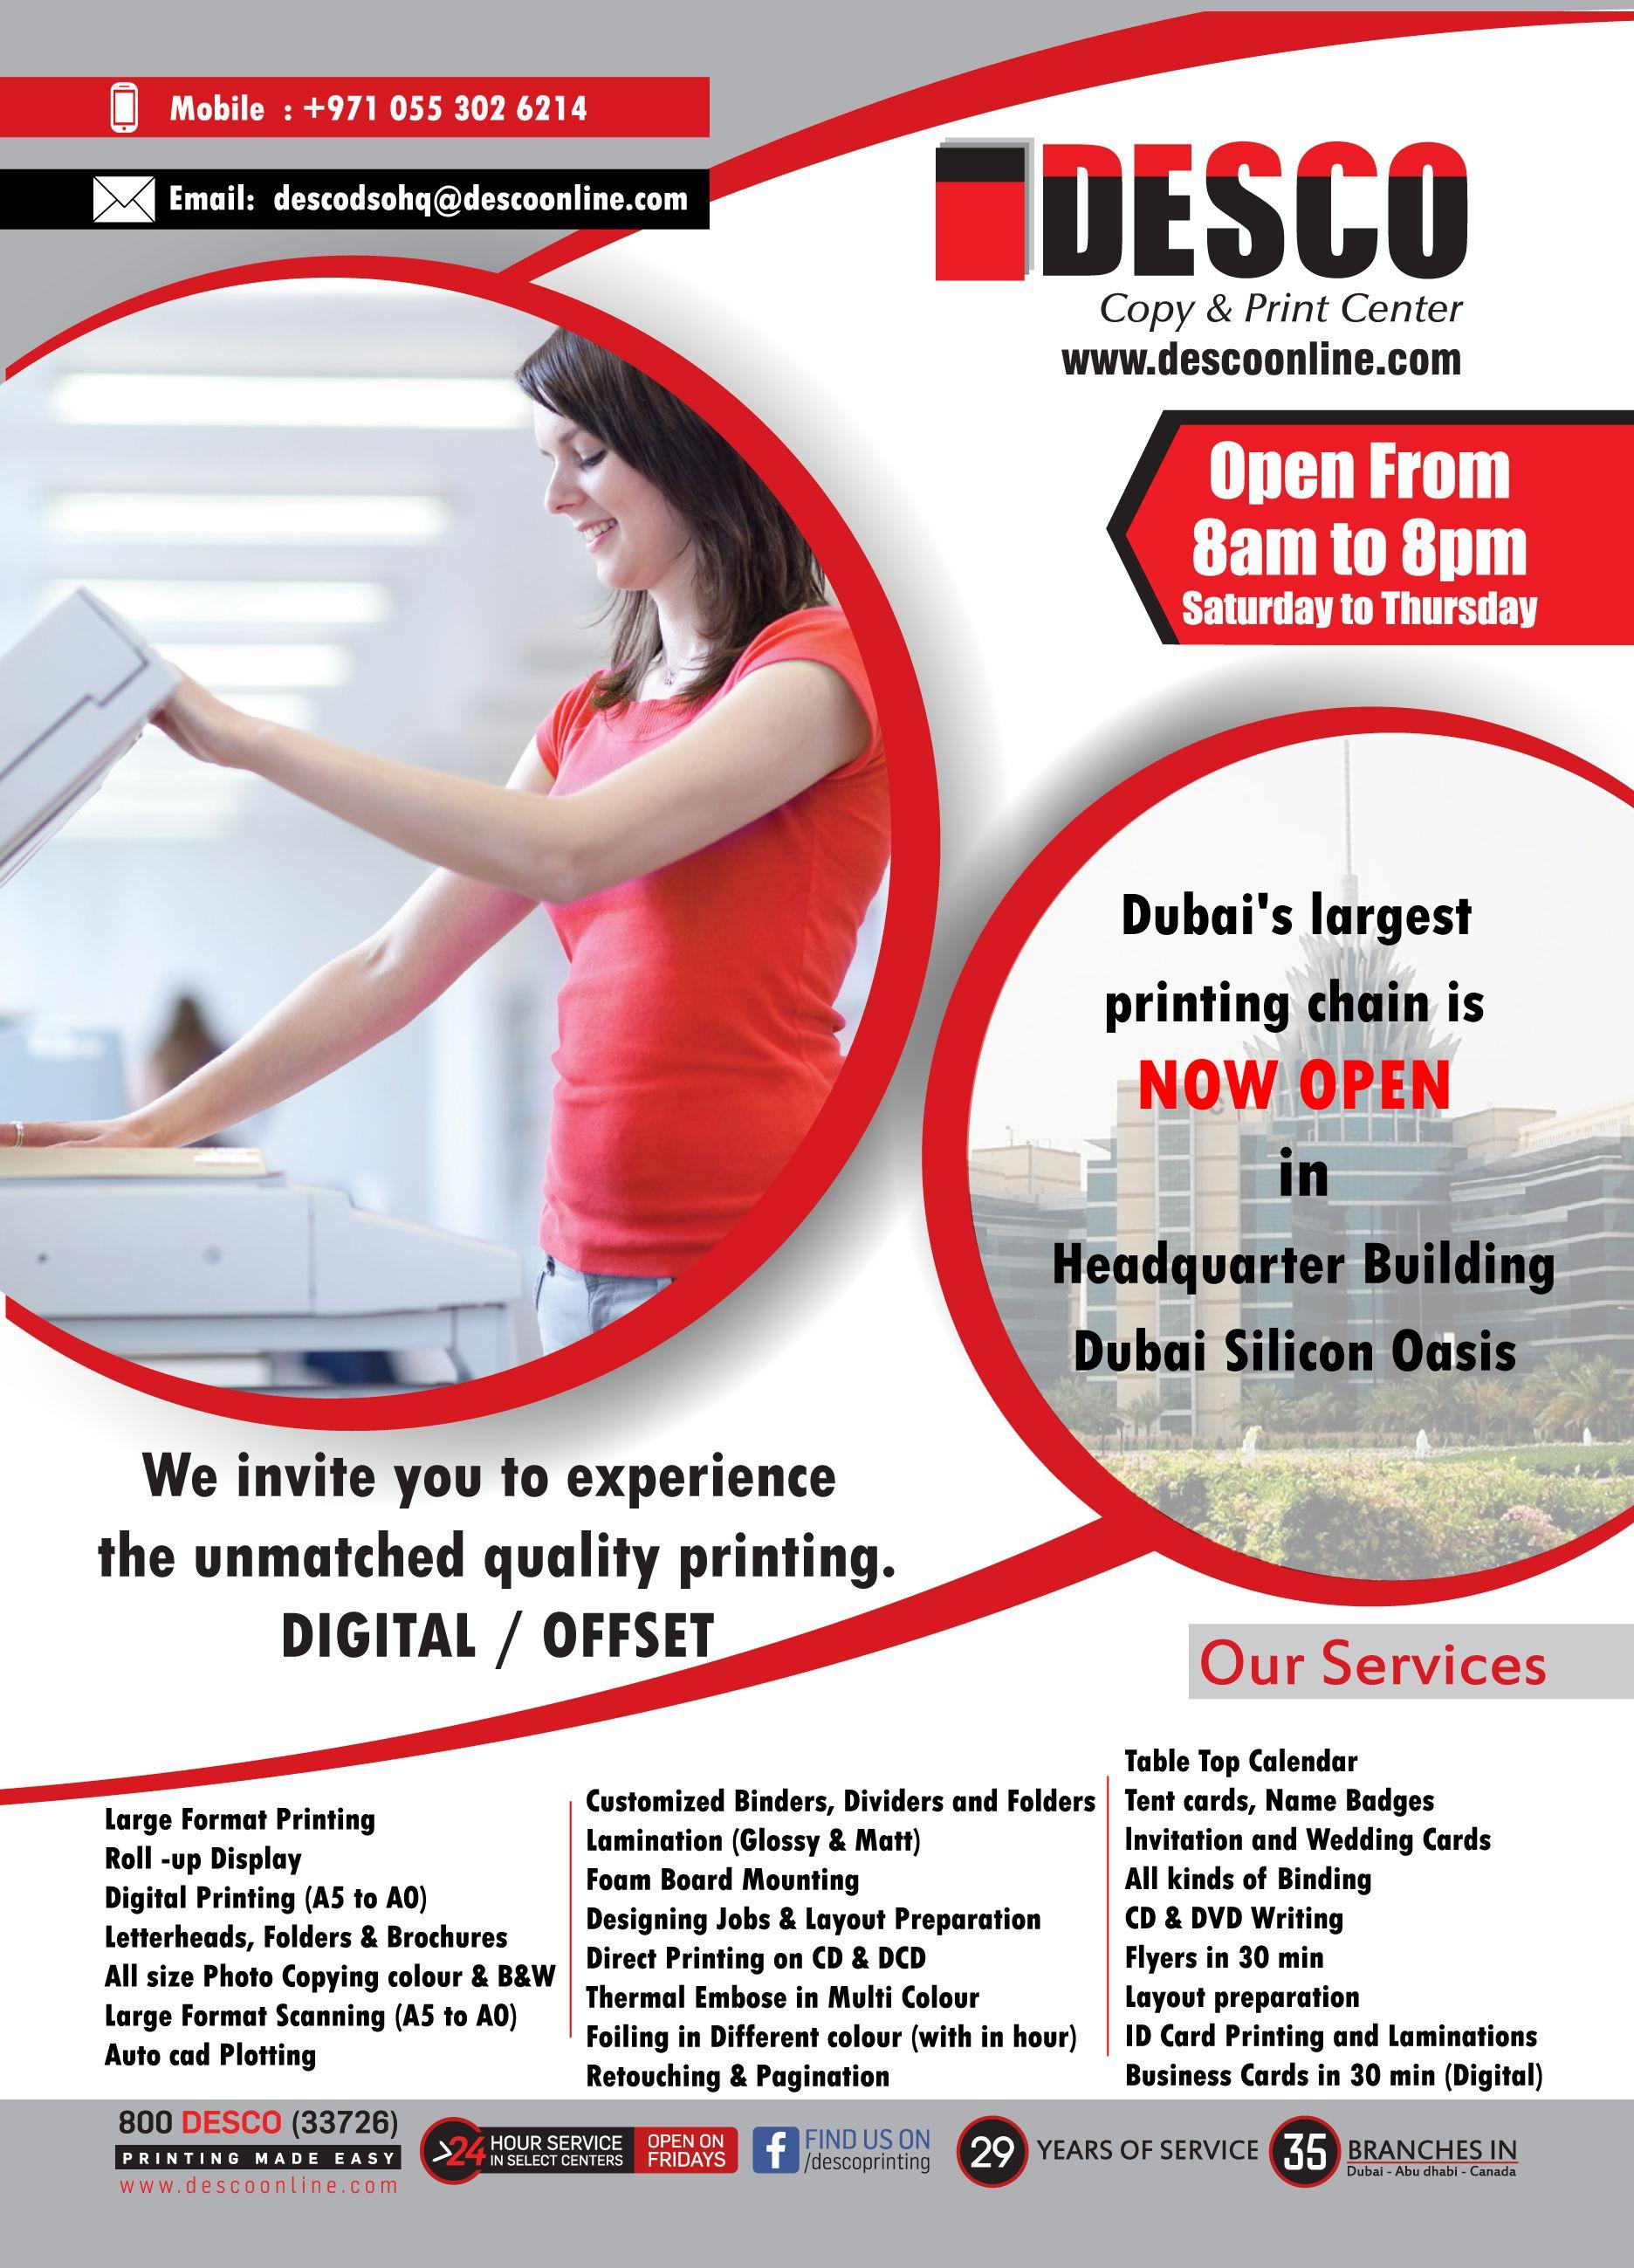 Printing Press in Dubai Silicon Oasis HQ - Printing in DSO HQ